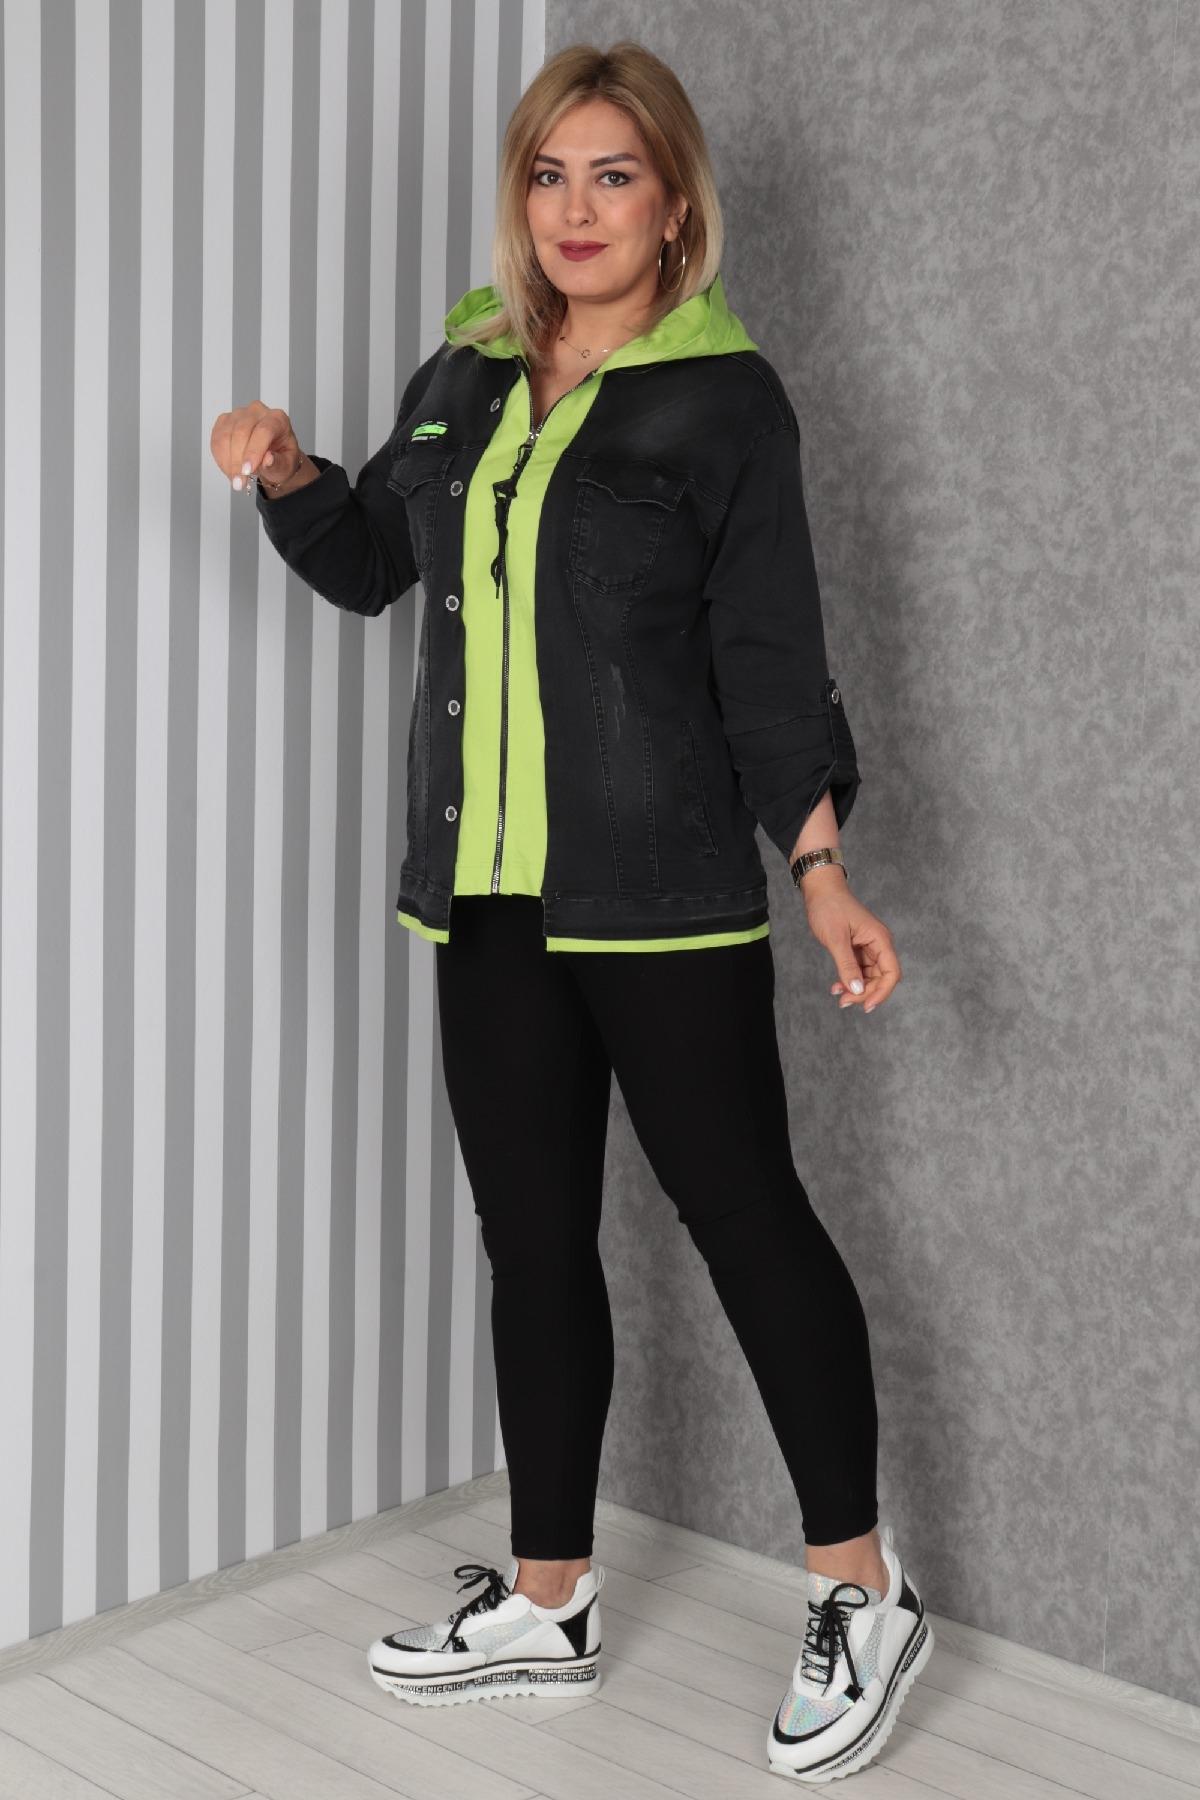 Trench Coats-Neon Green